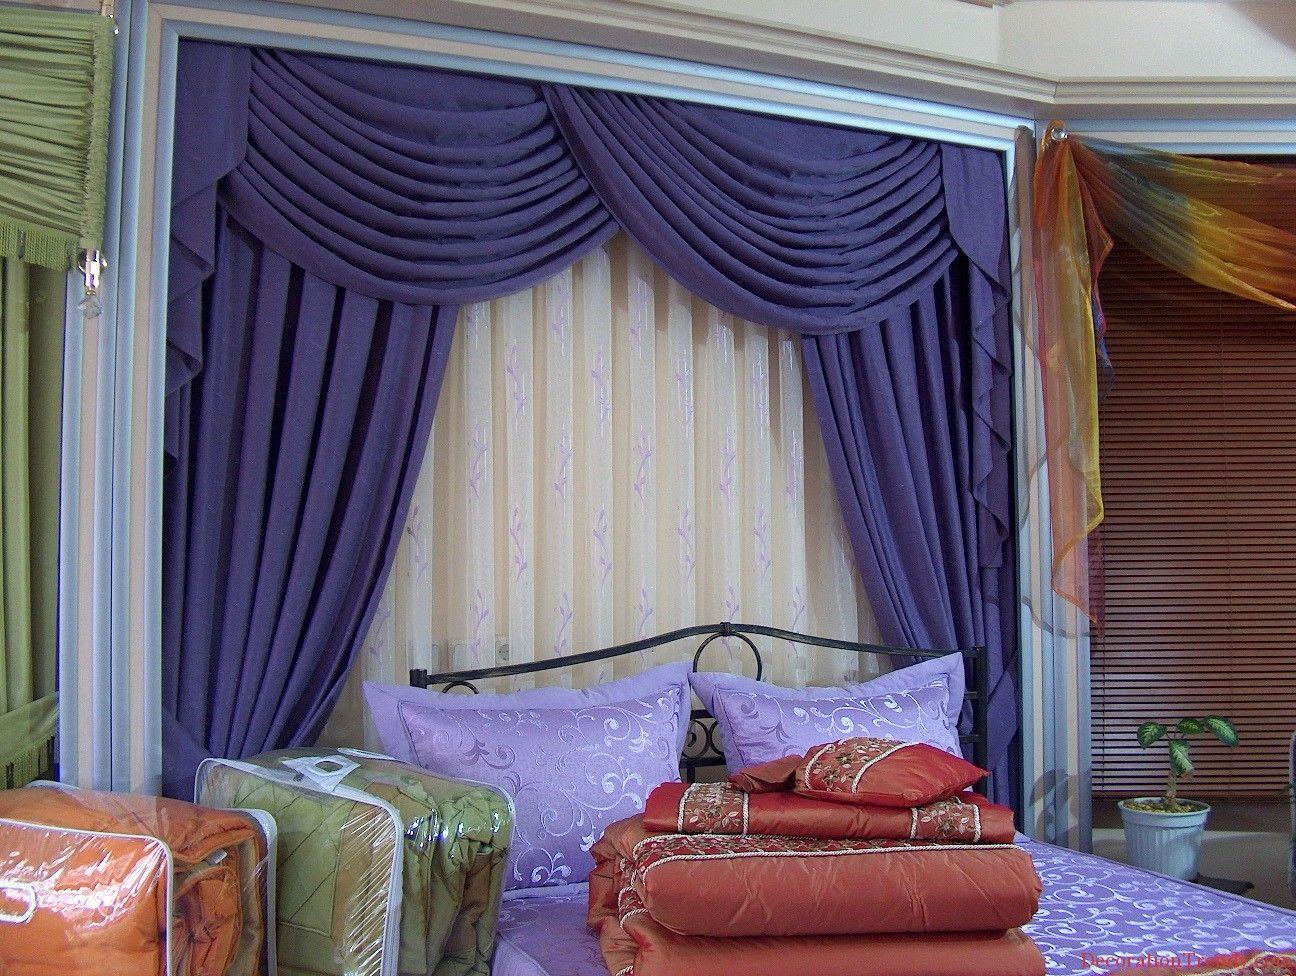 2014 Modern Curtain Fabric Models Design Decor 8 Best Curtain Fabric Design  Decor For 2014